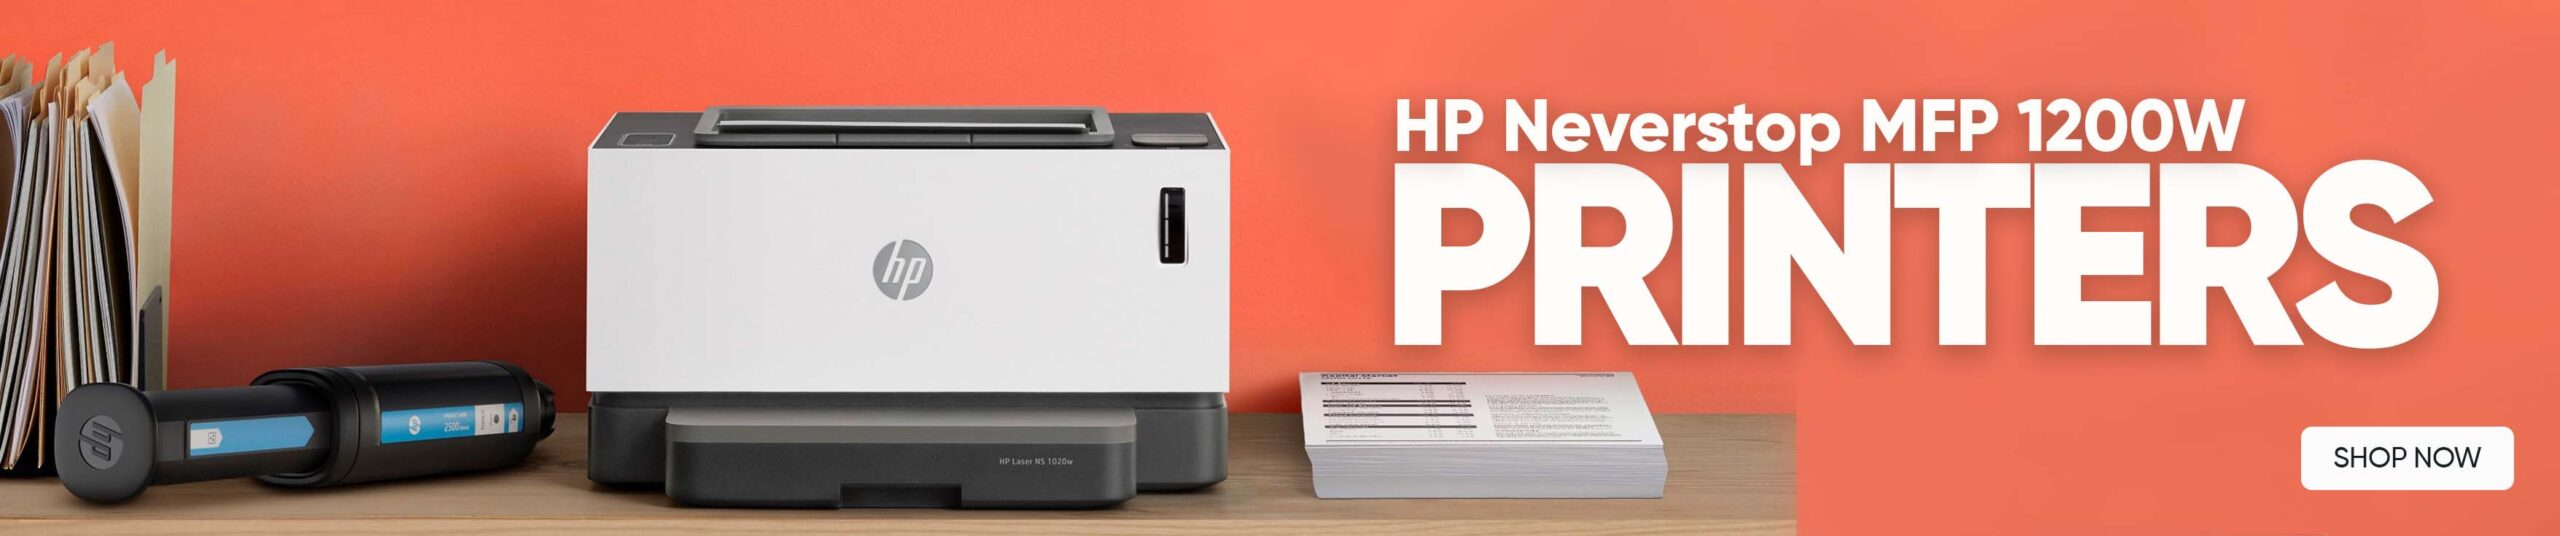 HP Neverstop MFP 1200W